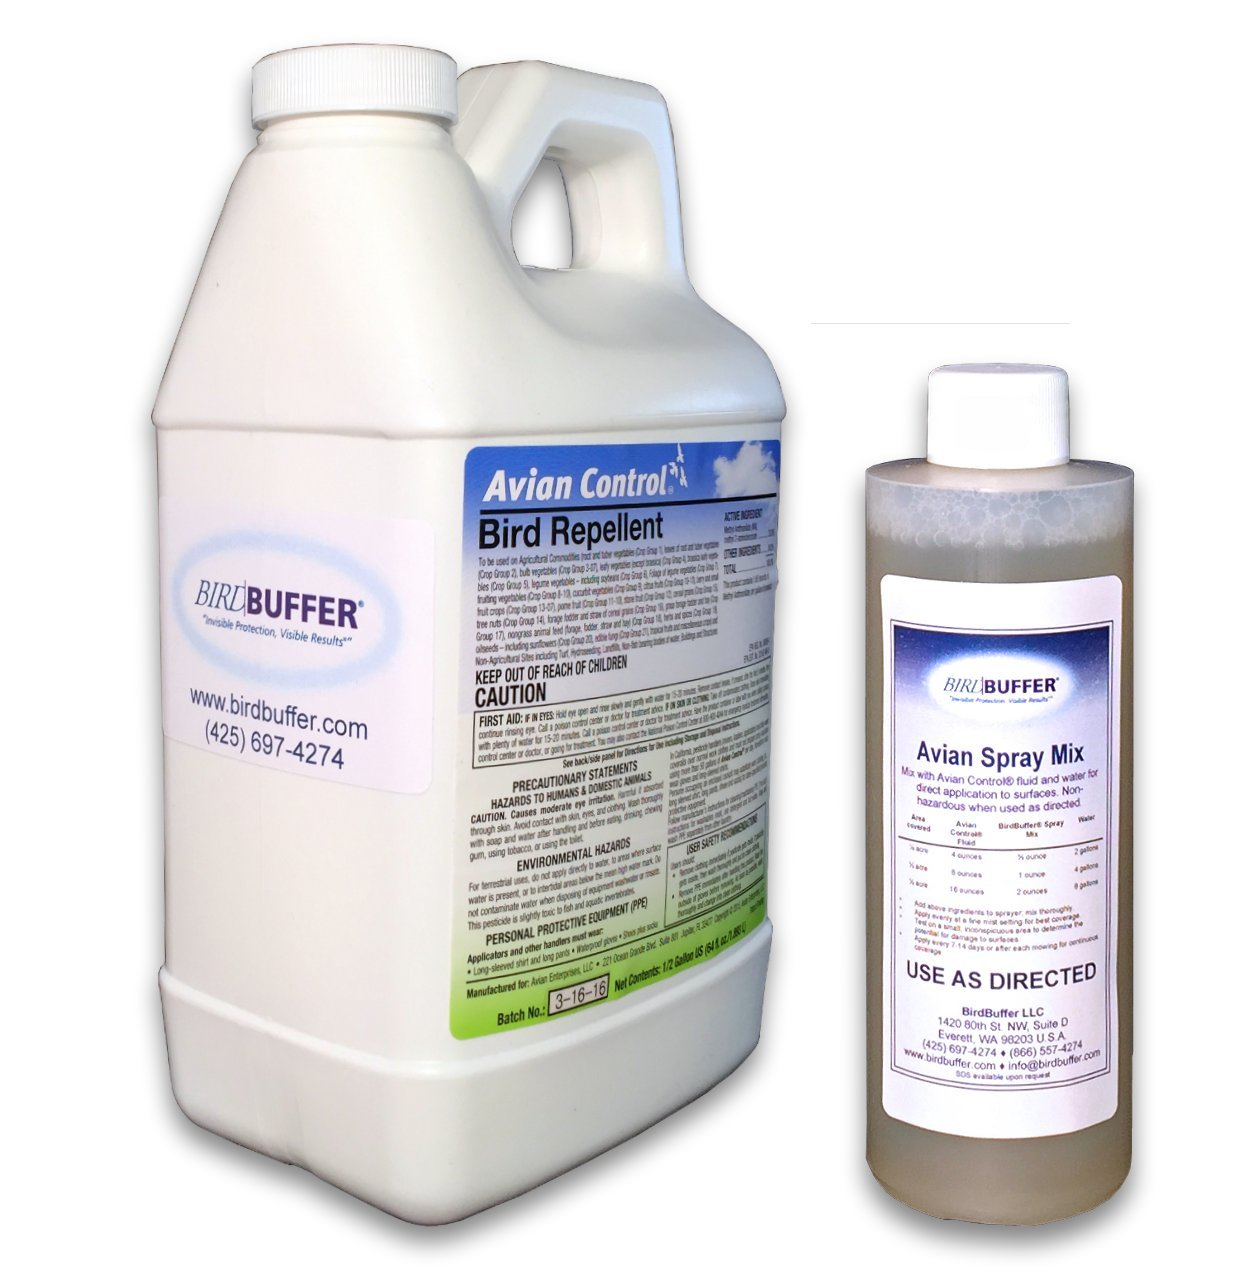 BirdBuffer Half Gallon Refill Bottle of Avian Control Fluid with Surfactant by BirdBuffer